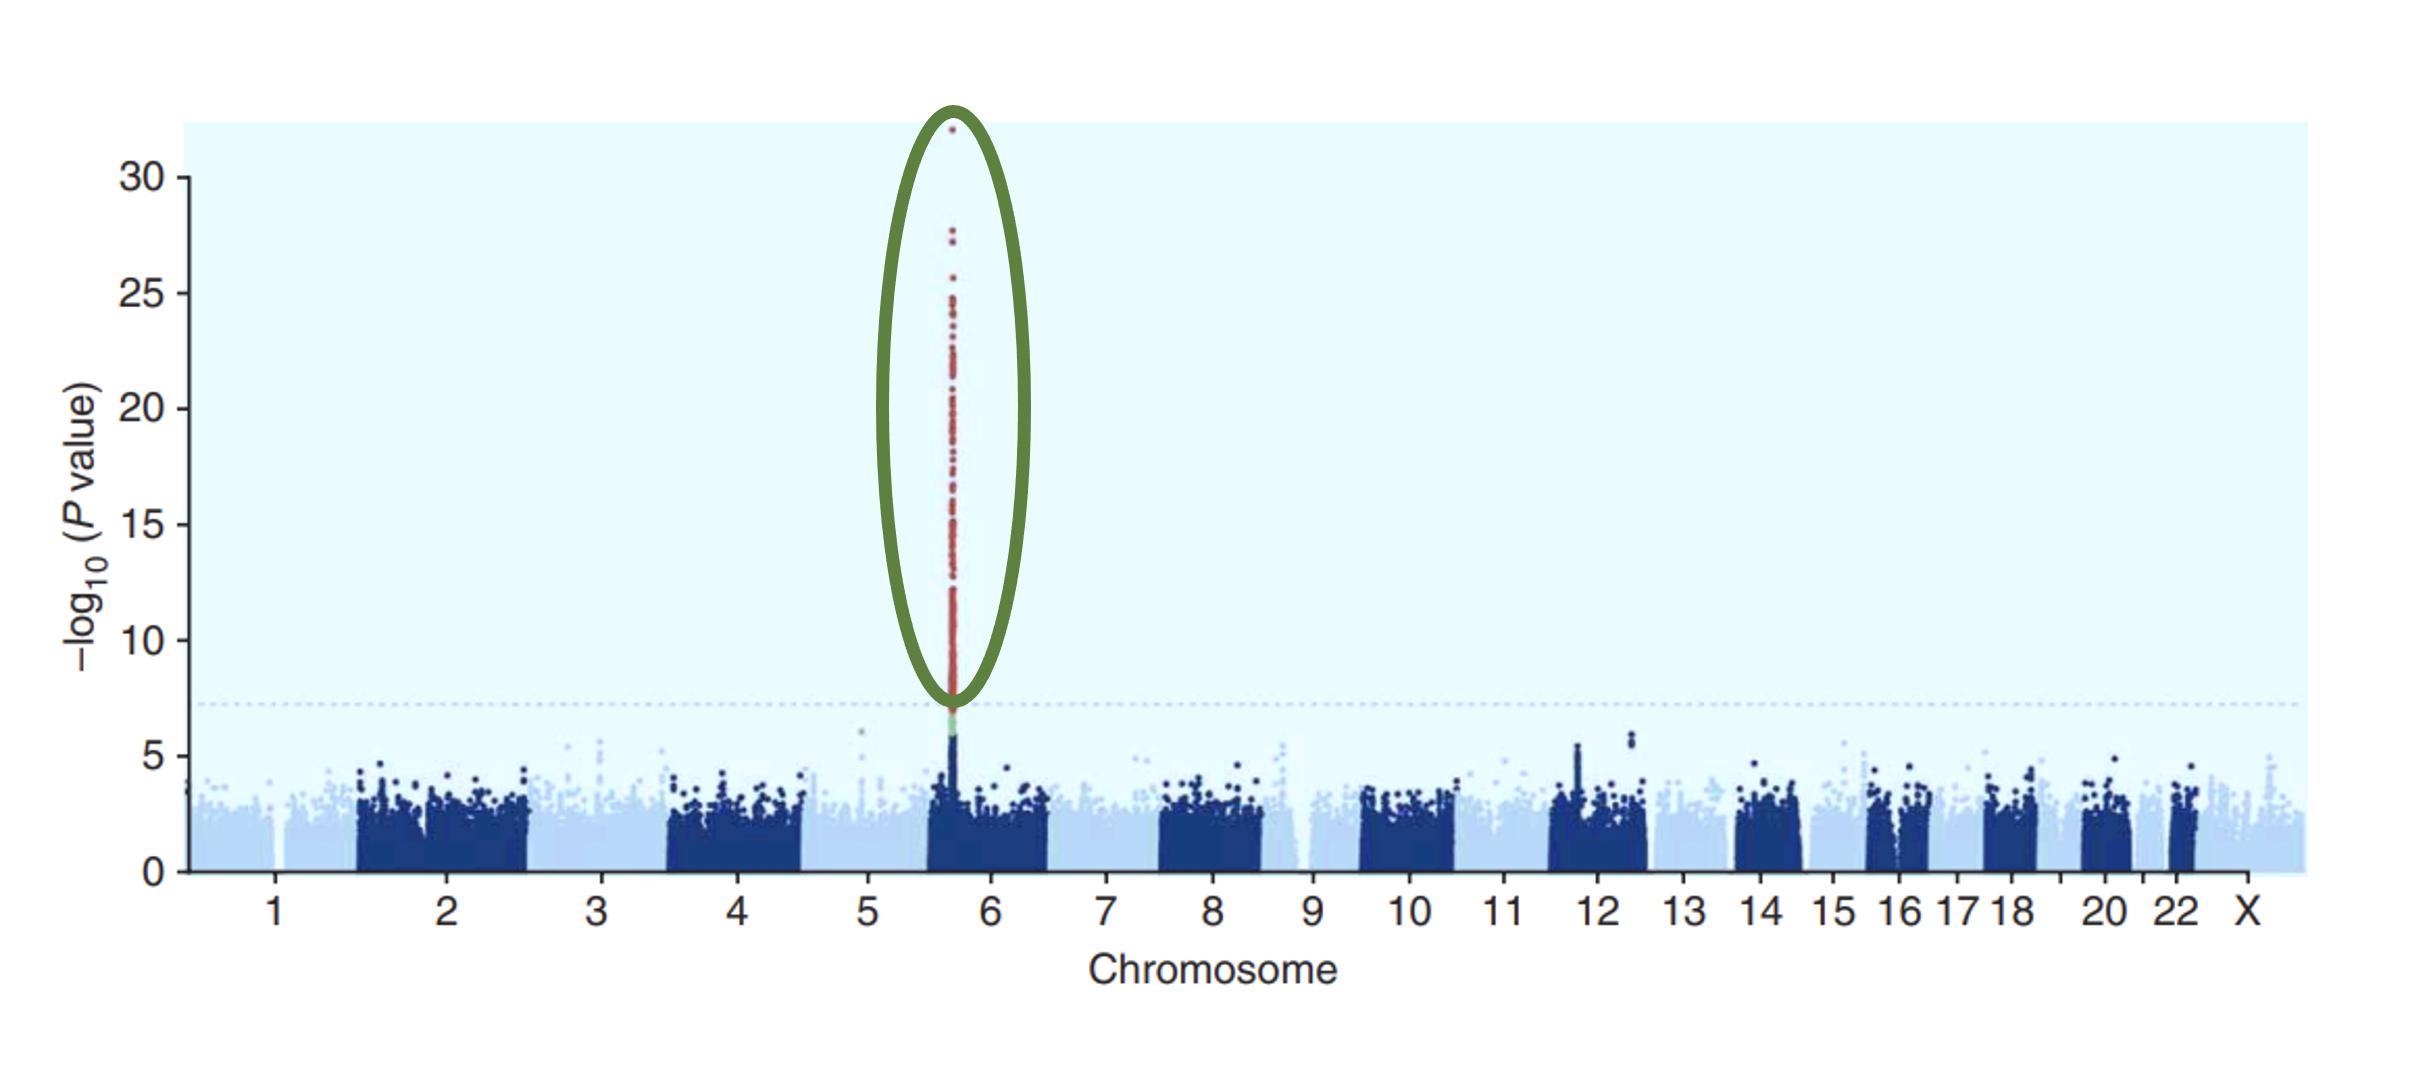 Conventional univariate Methodology generating single peak